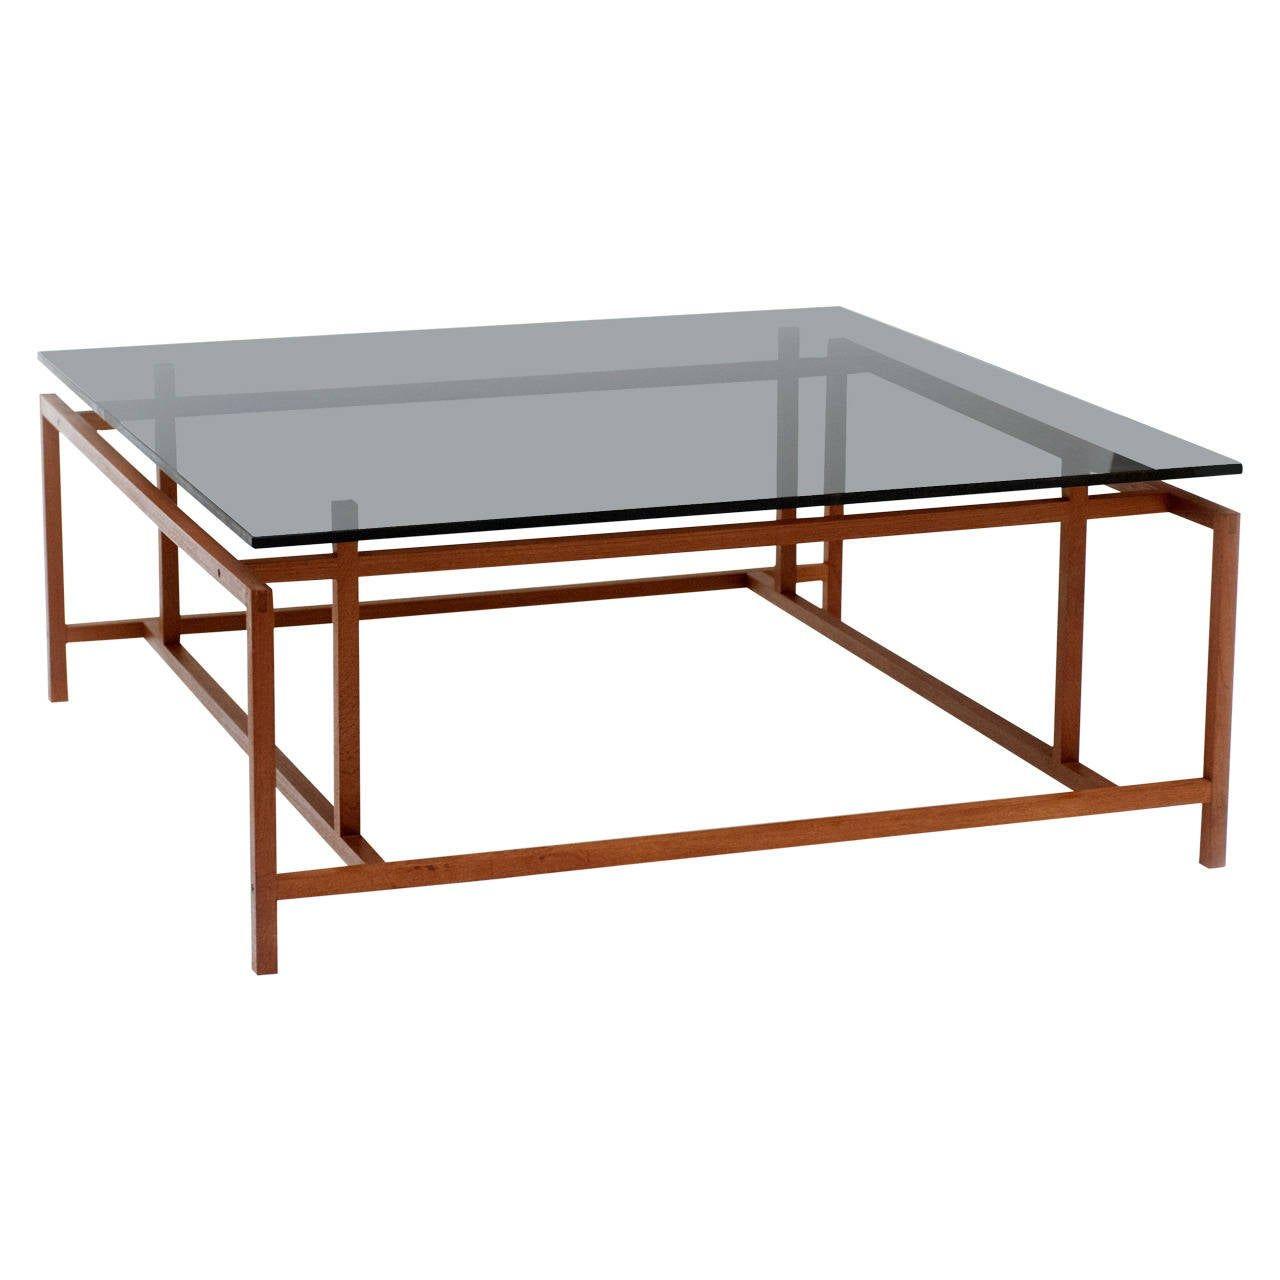 Danish modern large komfort coffee table by henning